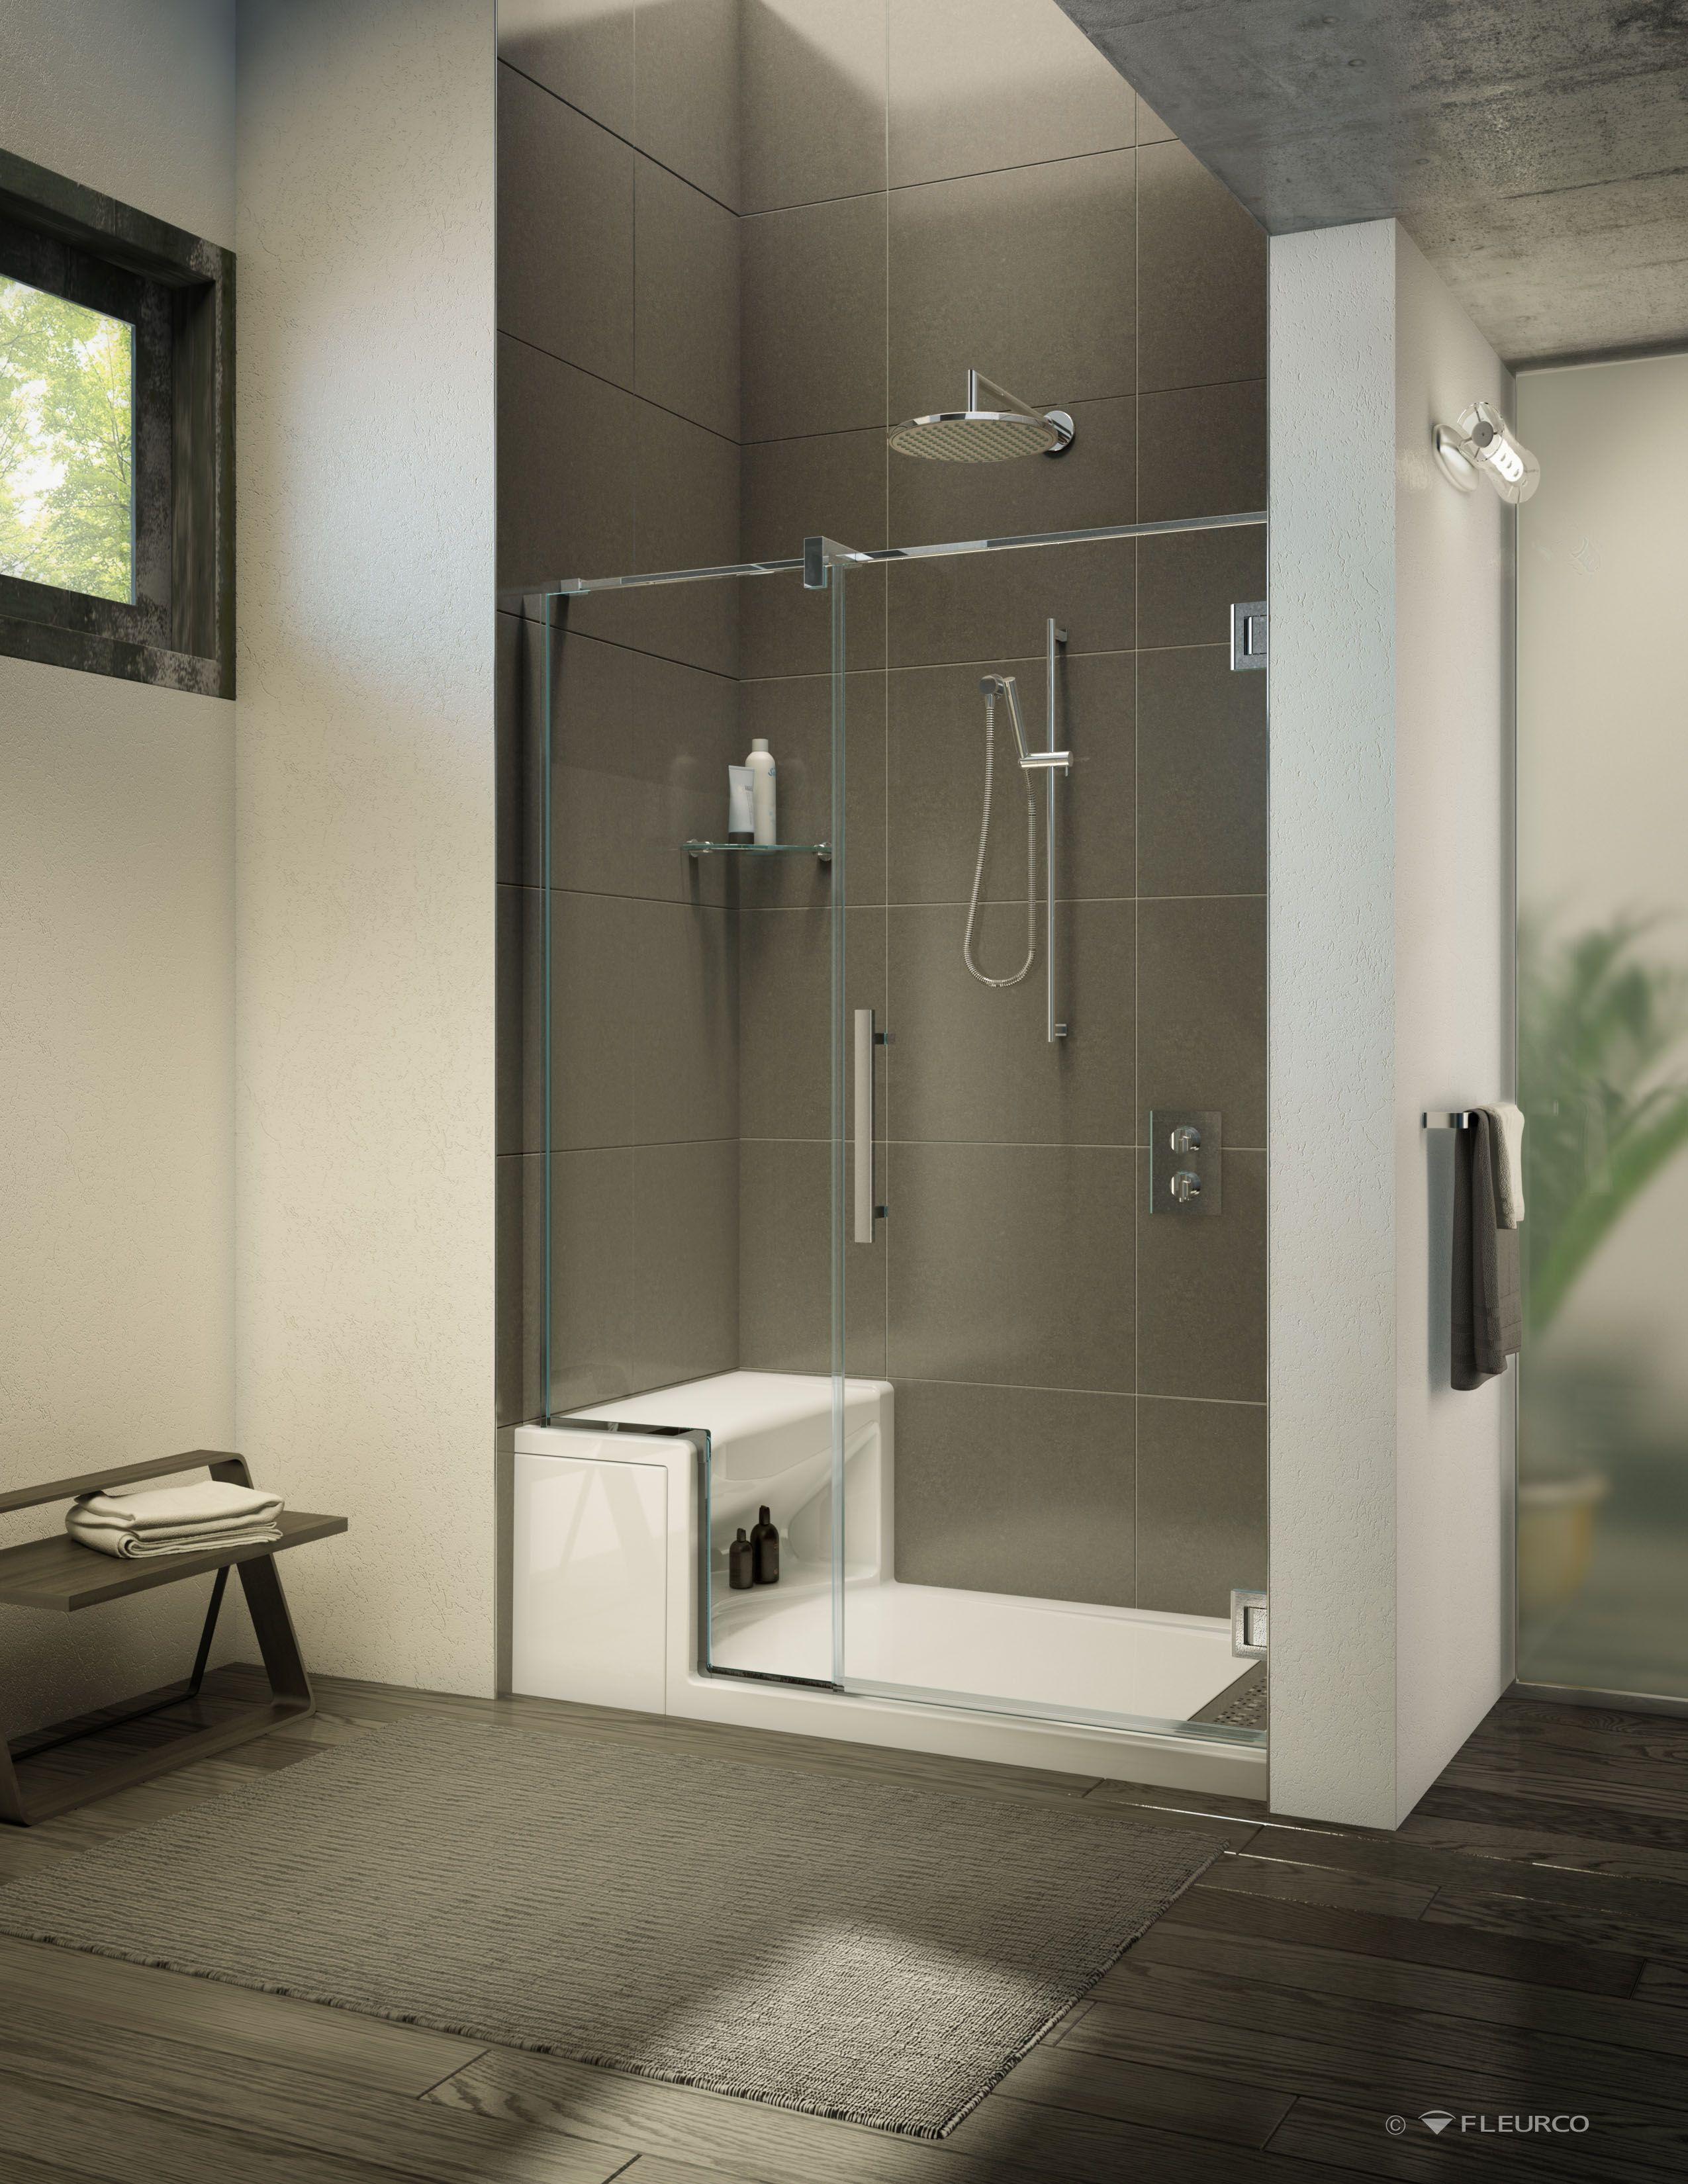 modern bathroom with fleurco s in line shower door with shower modern bathroom with fleurco s in line shower door with shower base and seat titan